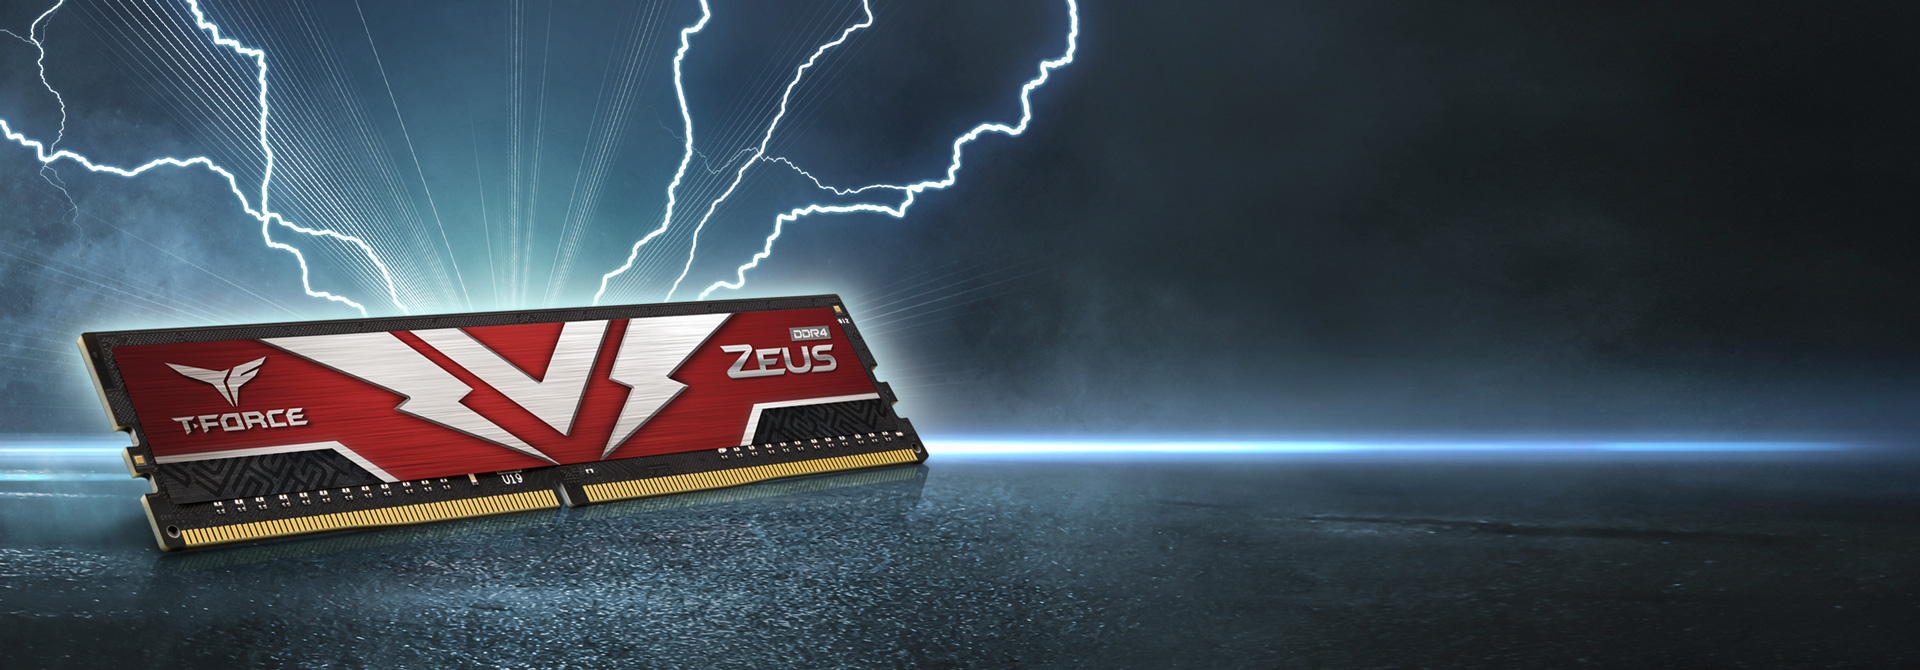 Lightning Bolt design element